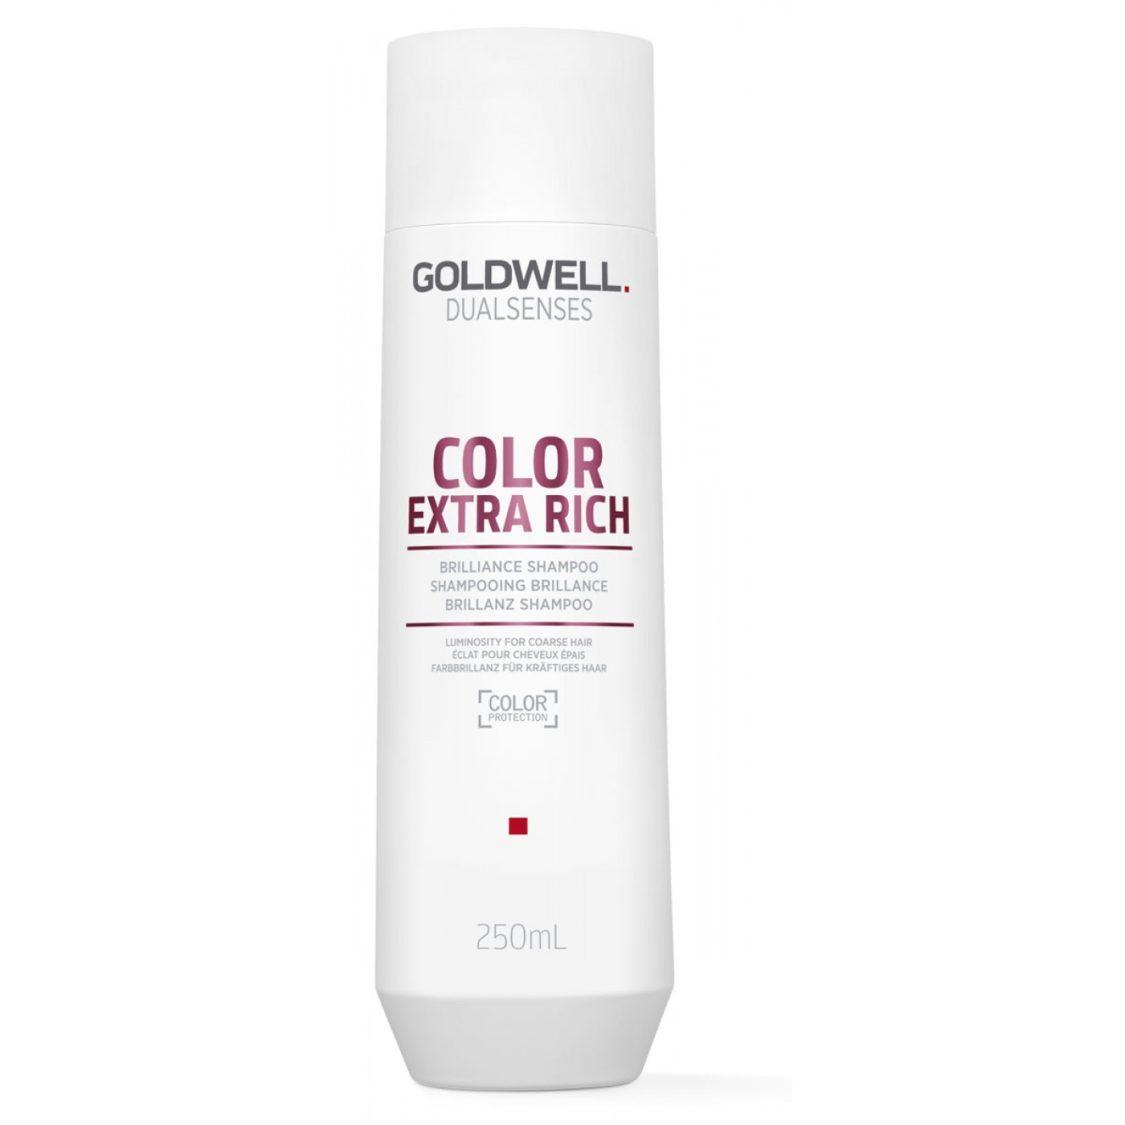 Goldwell - Dualsenses Color Extra Rich Brilliance Shampoo 250ml